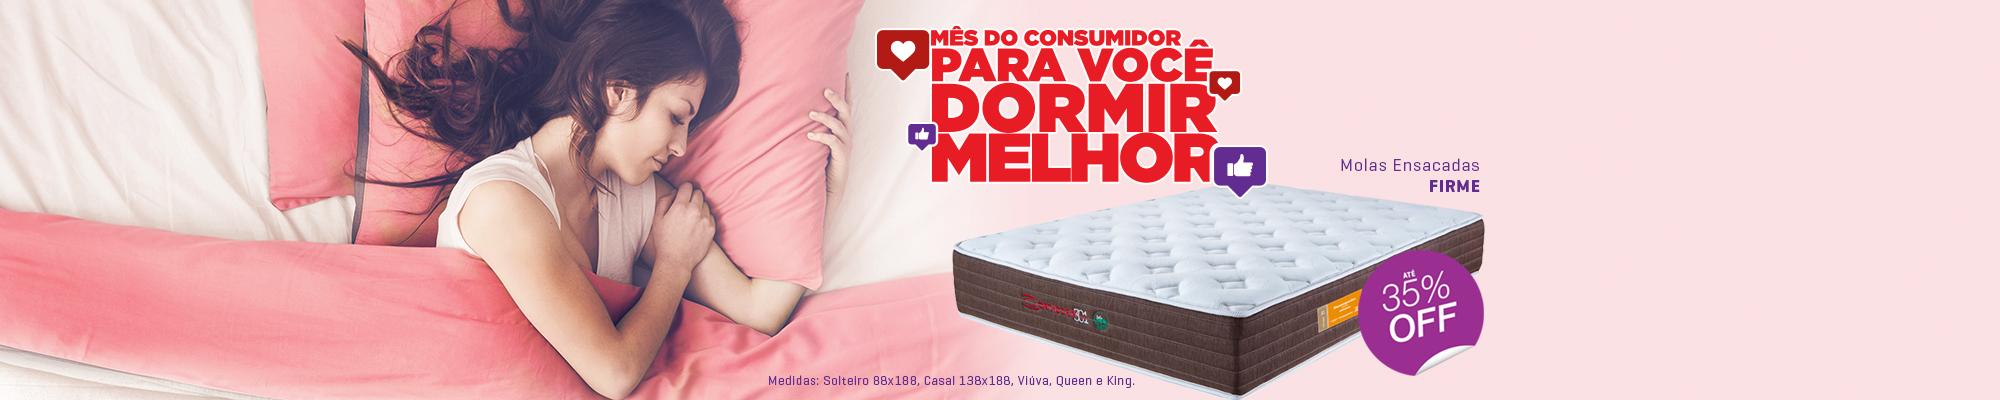 Consumidor 301